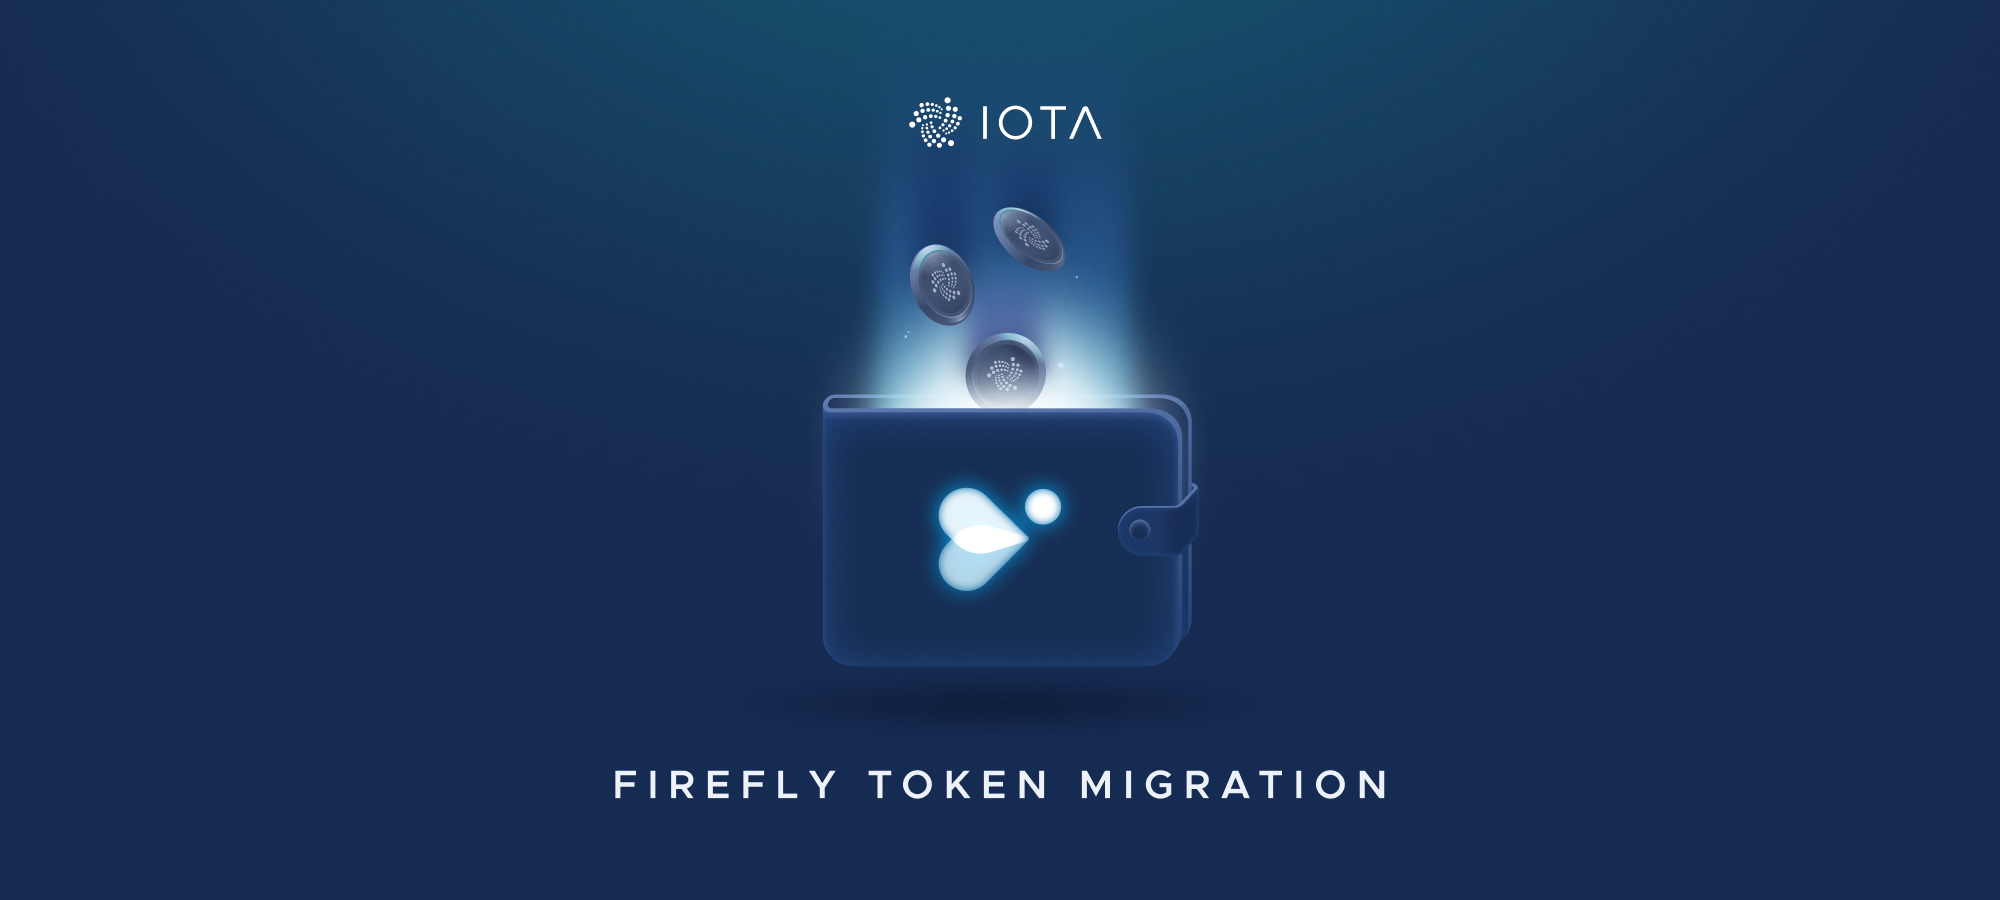 Firefly Token Migration